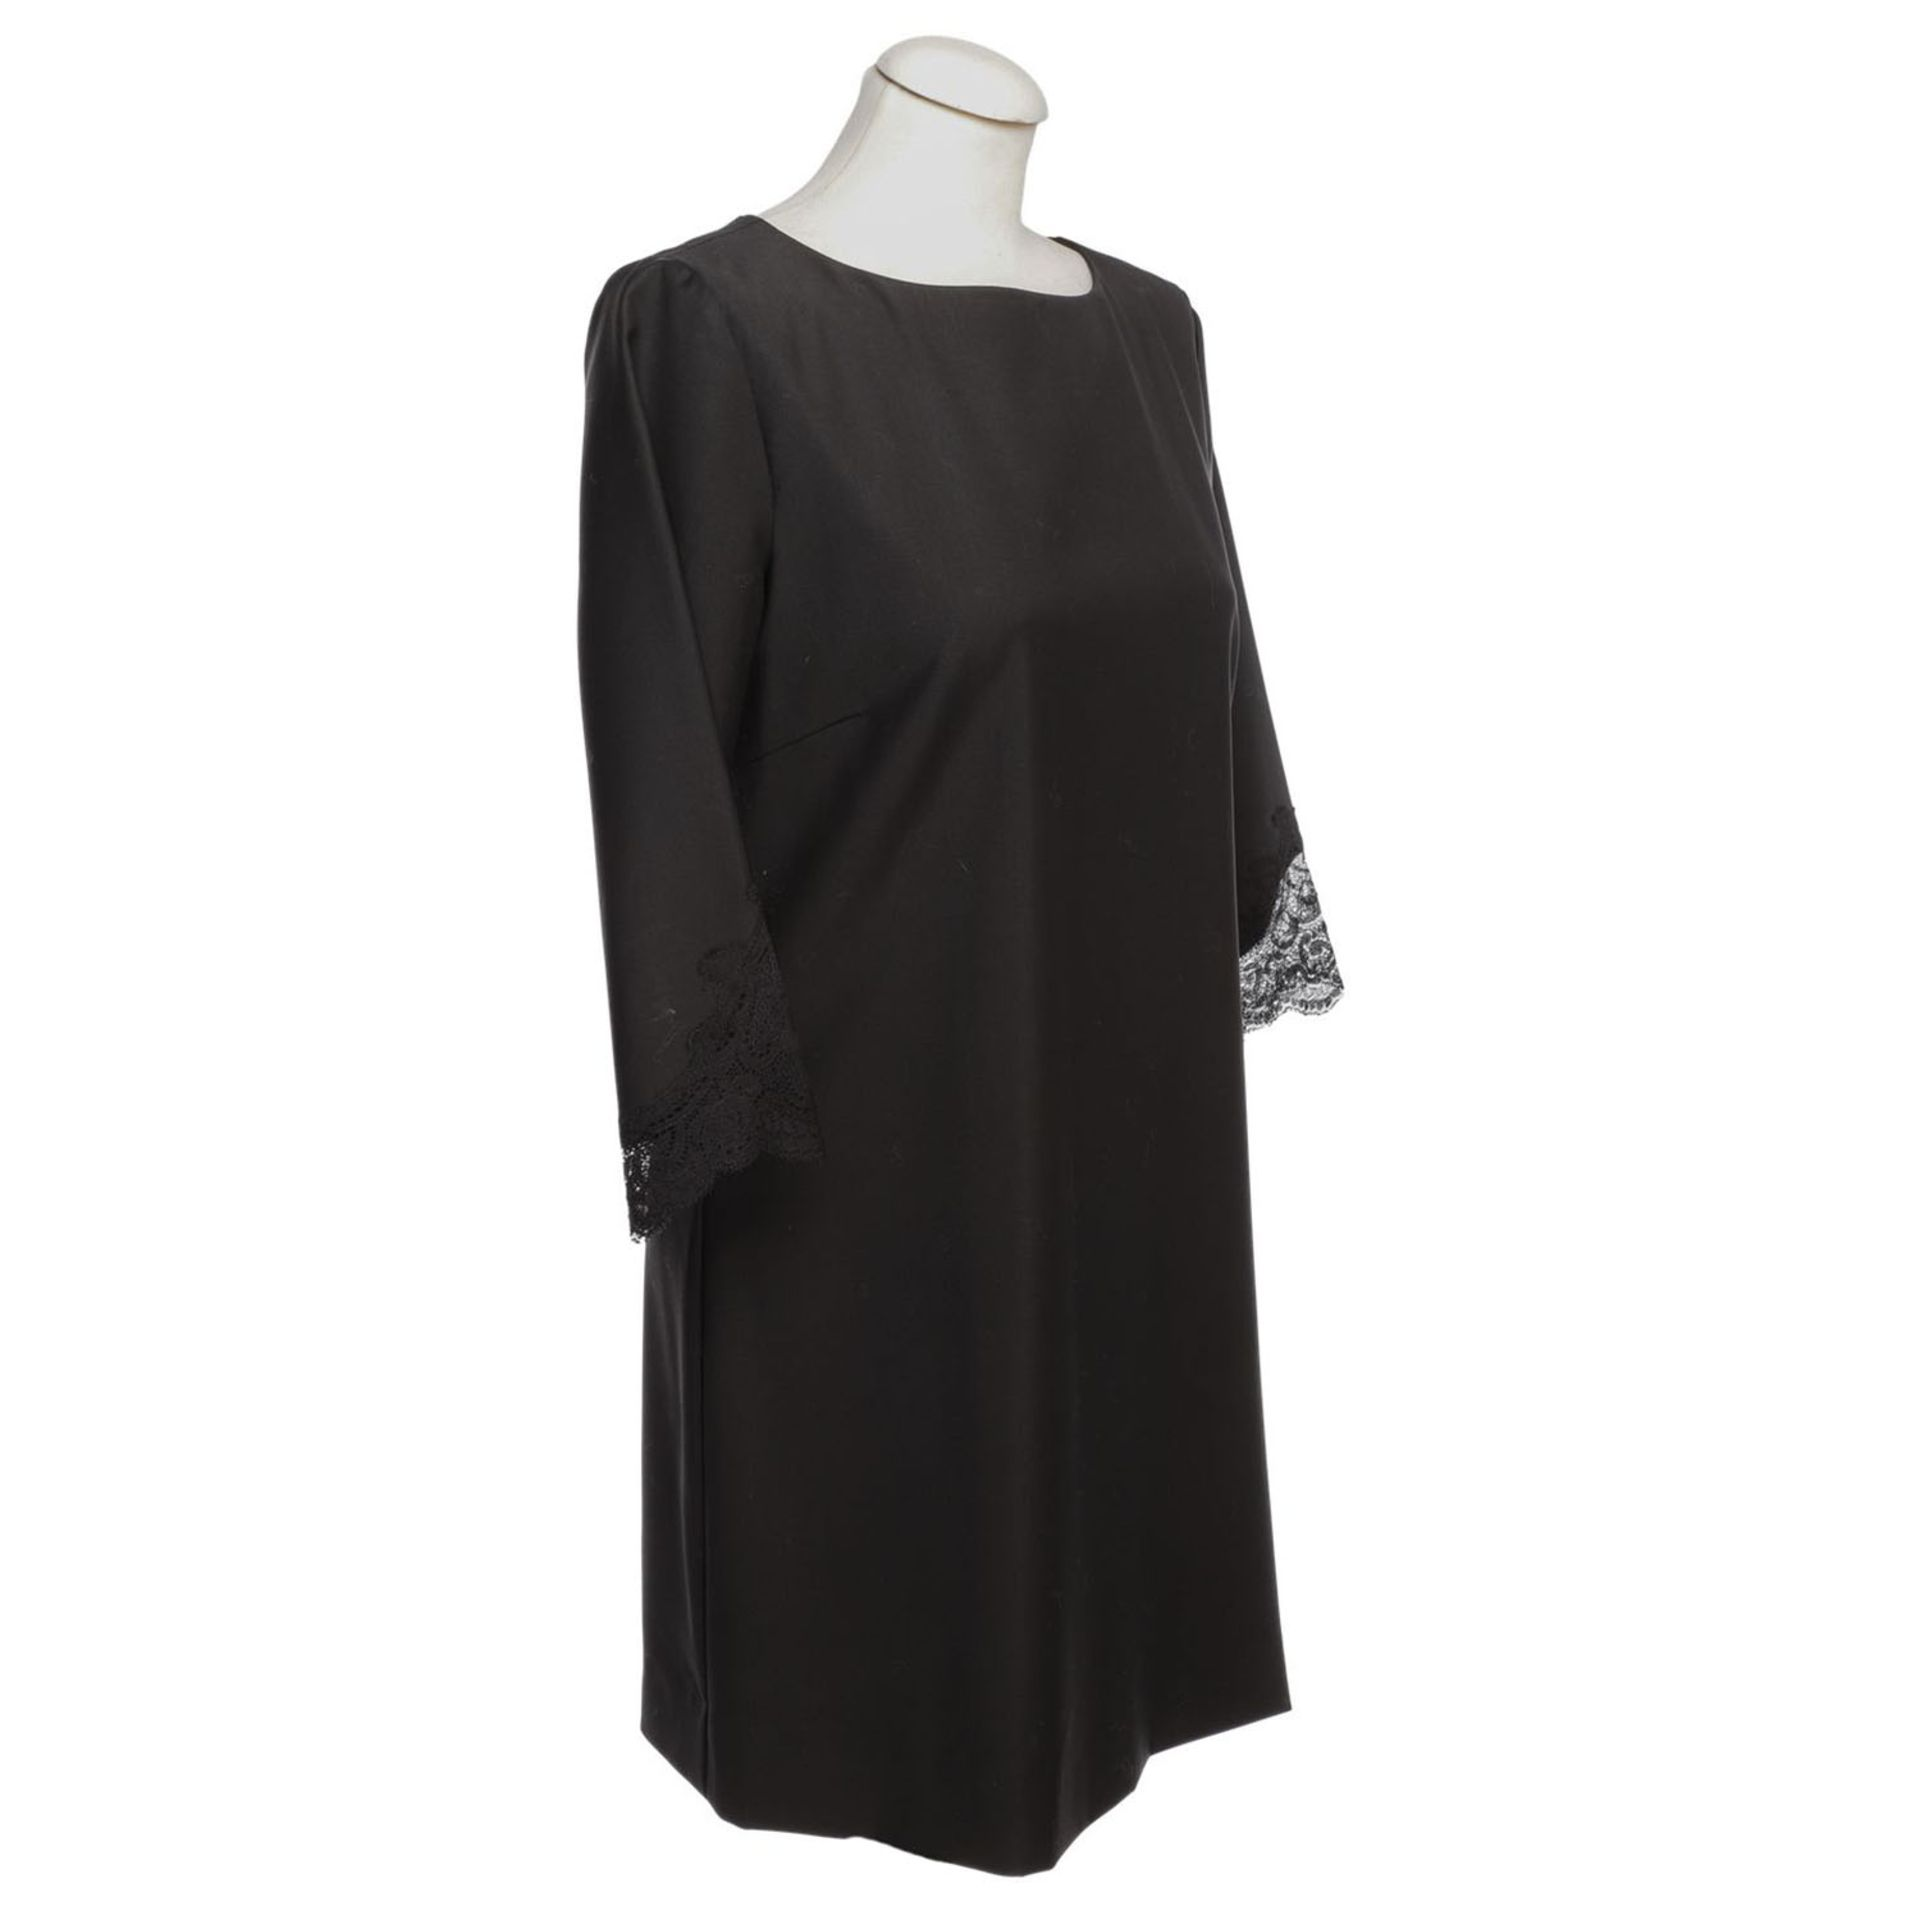 PATRIZIA PEPE Kleid, Gr. 38 (ital. 44). - Bild 2 aus 4